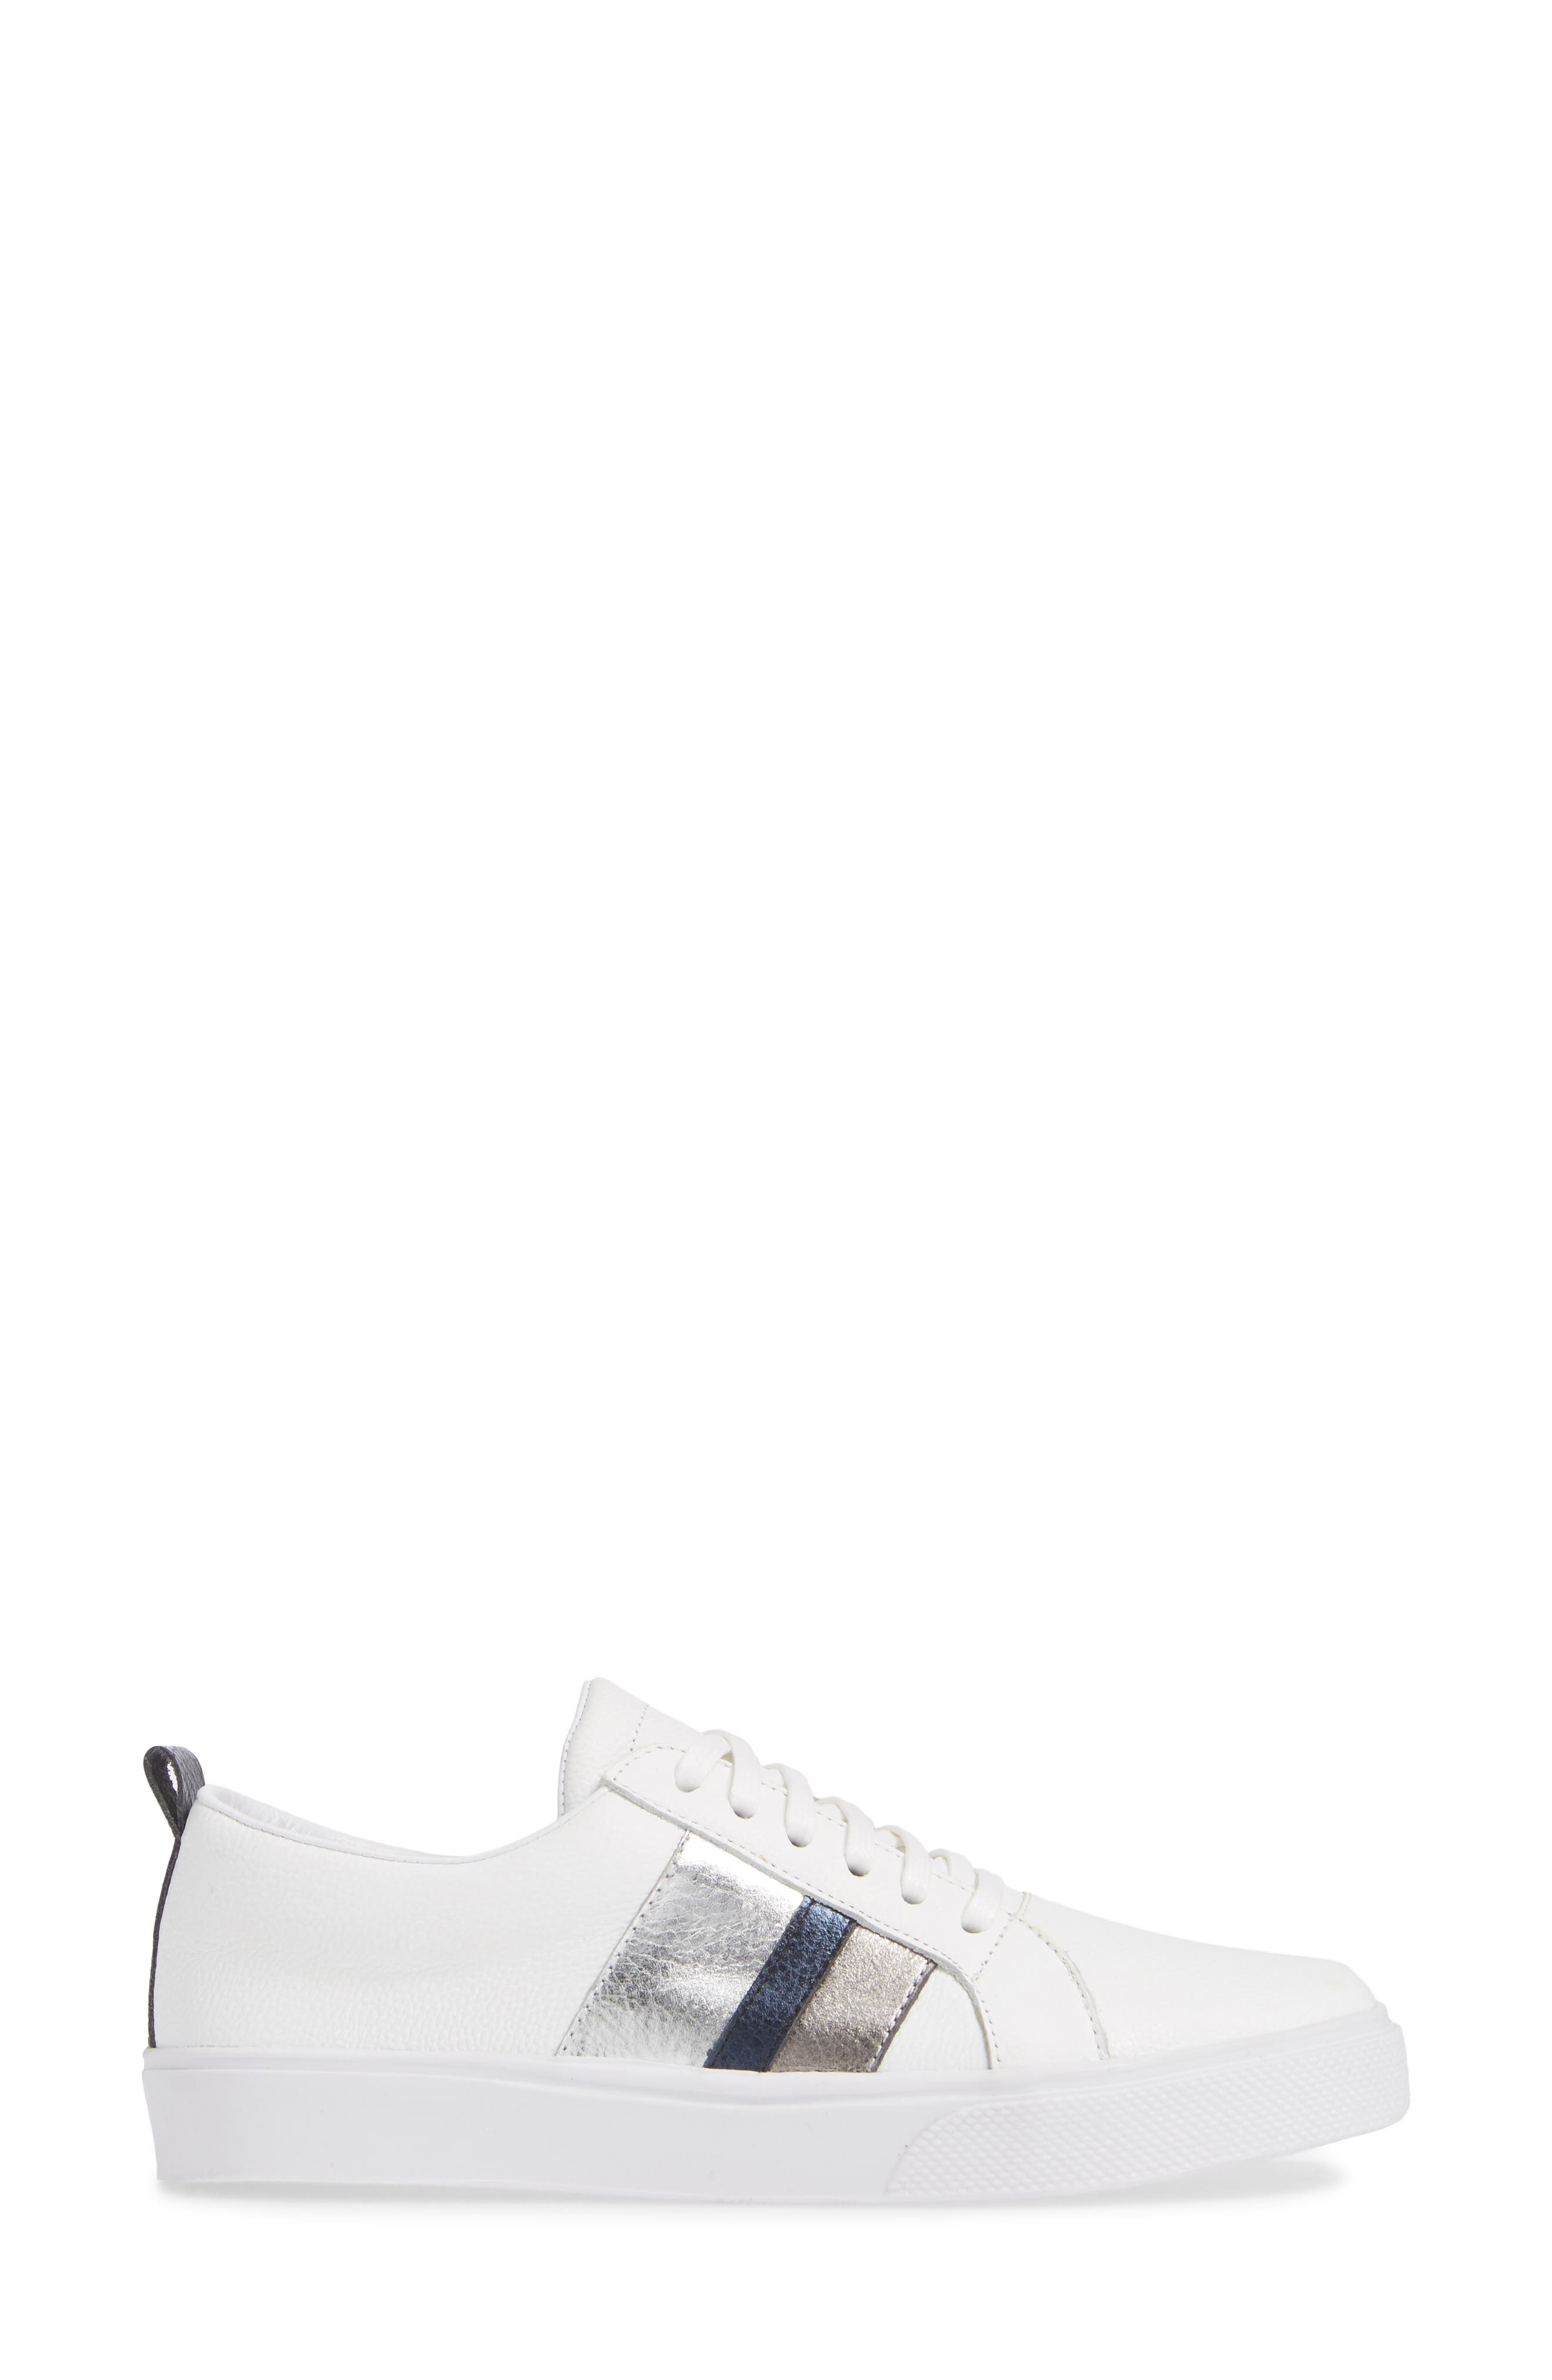 Bristol Sneaker,                             Alternate thumbnail 3, color,                             BLUE LEATHER